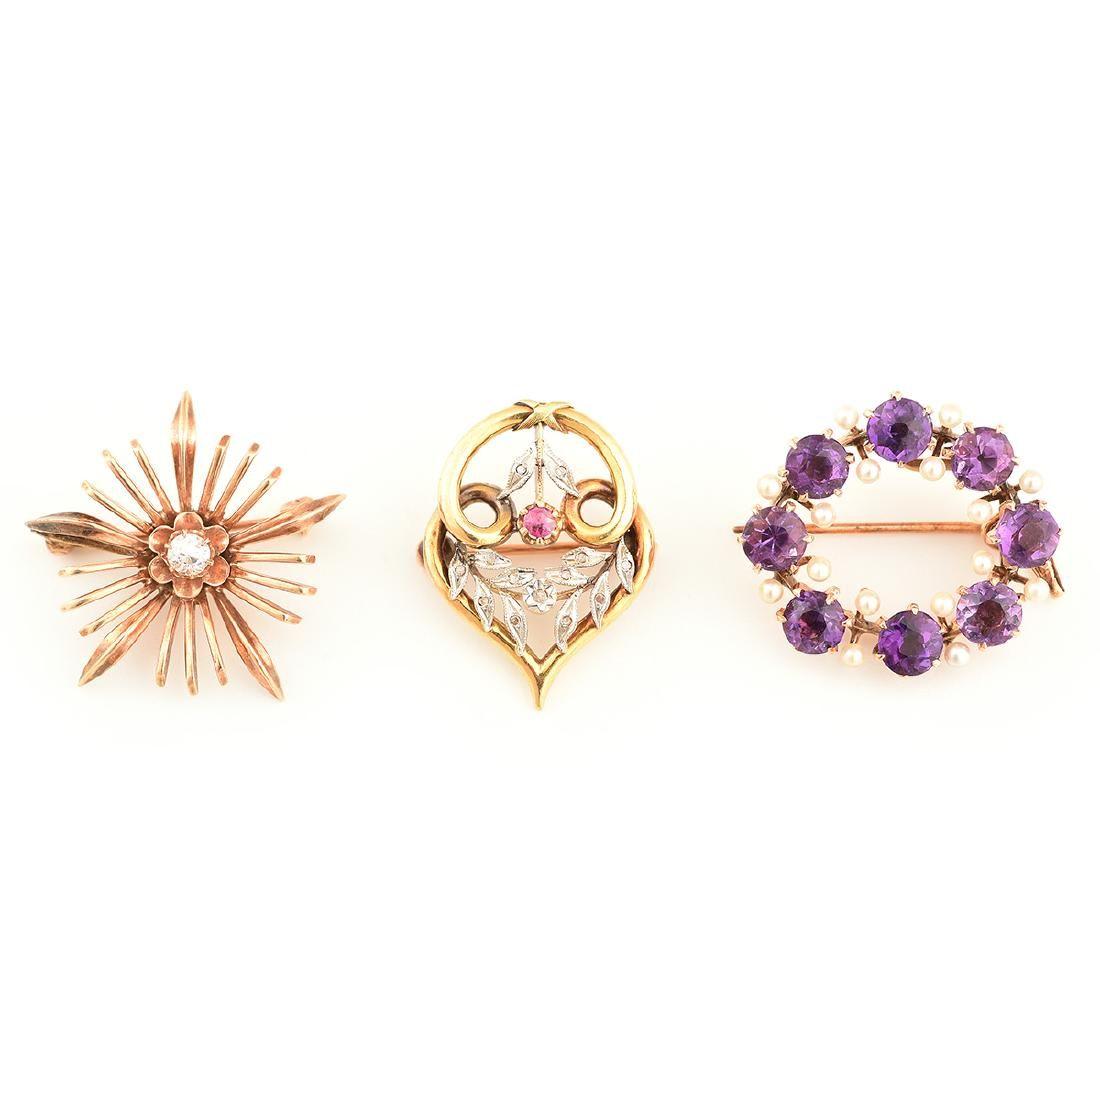 Collection of Three Multi-Stone, Diamond, Seed Pearl,